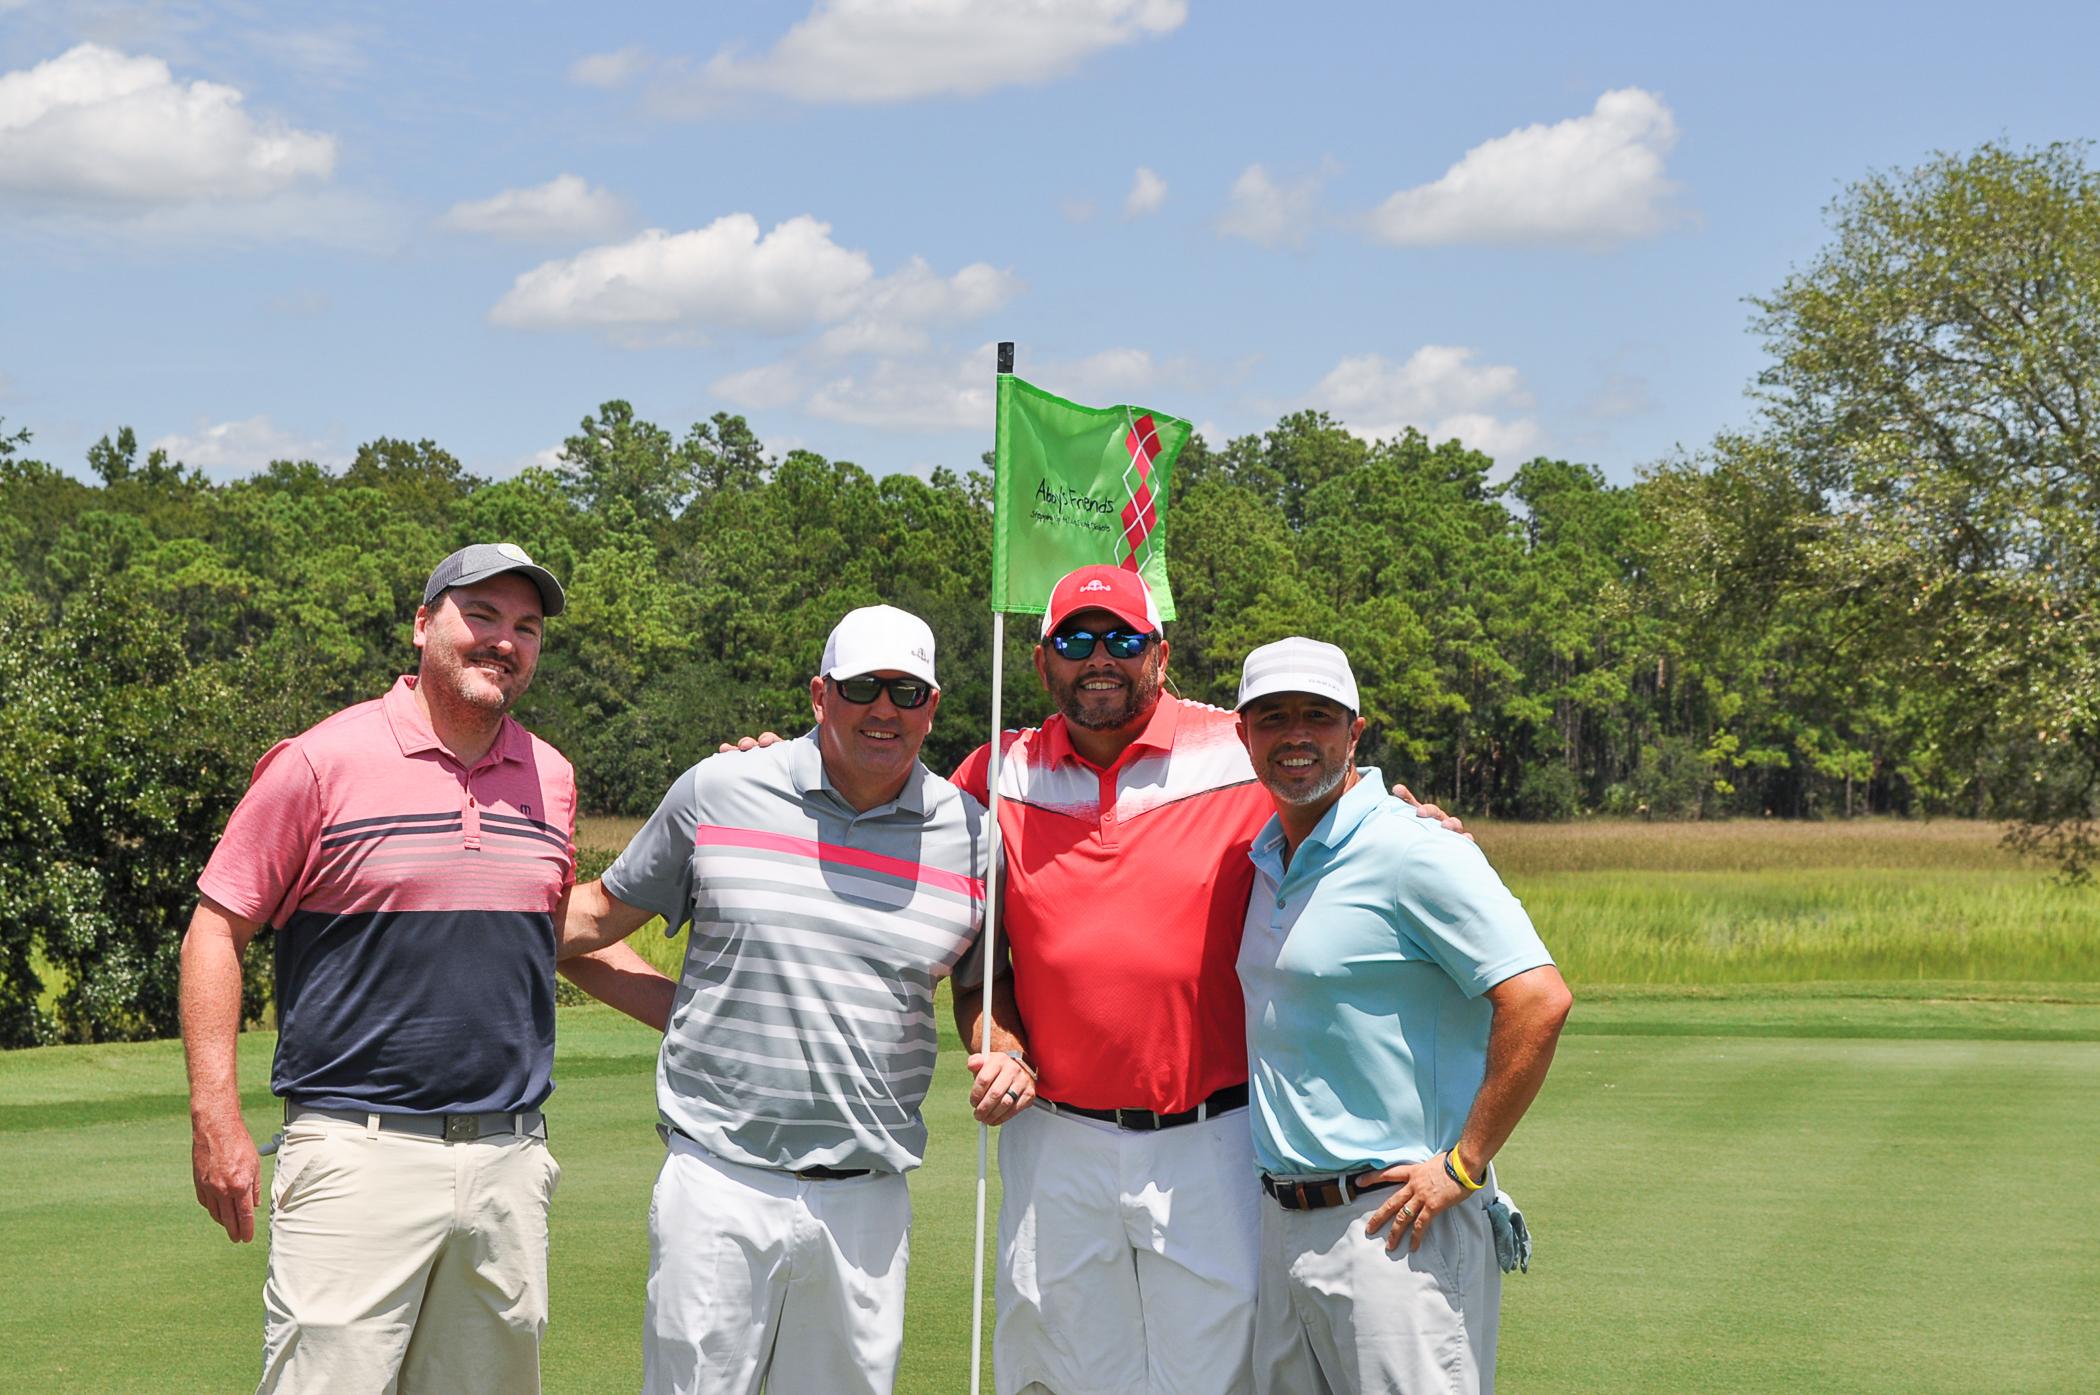 Mark Goddard, Matt Goddard, Rob Stephenson, and Rusty Hughes.